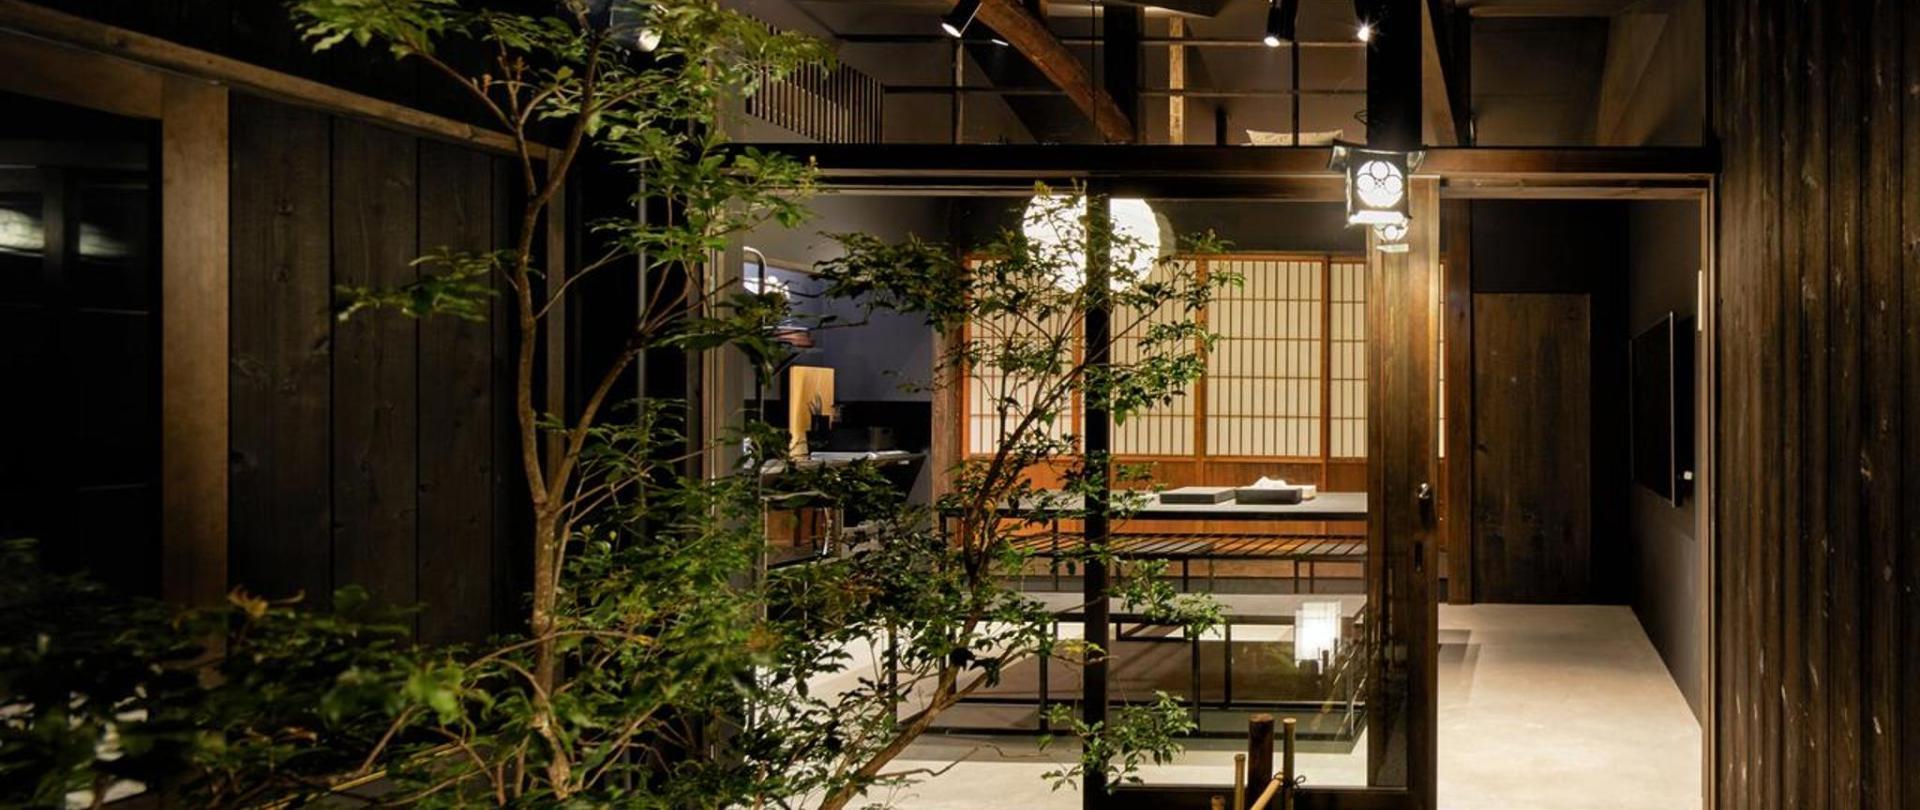 Yadoru京都 和紙之宿